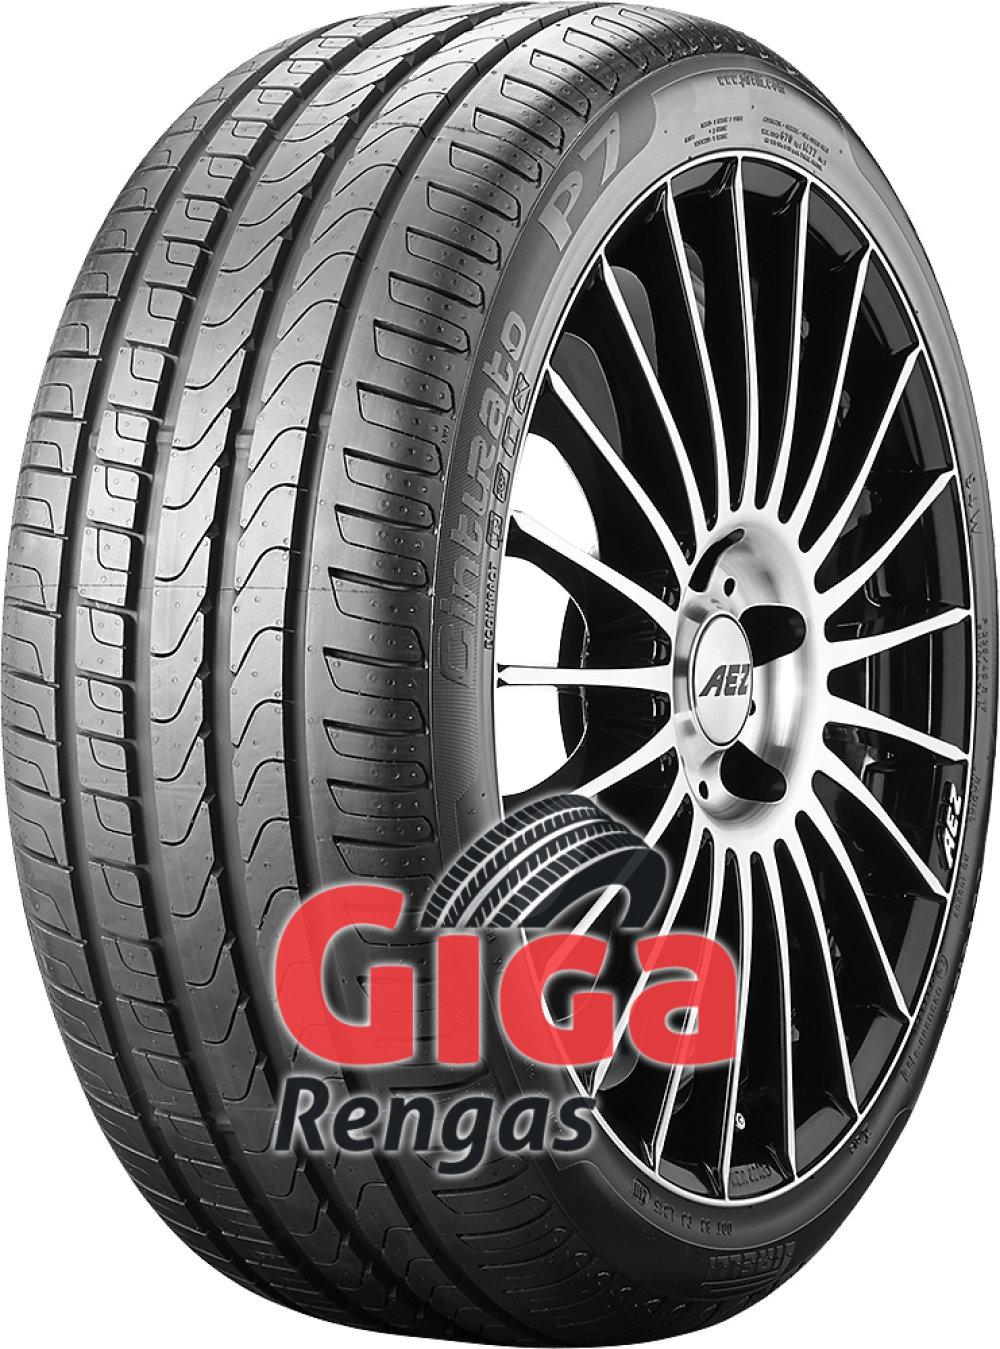 Pirelli Cinturato P7 runflat ( 225/55 R16 95W *, ECOIMPACT, vannesuojalla (MFS), runflat )